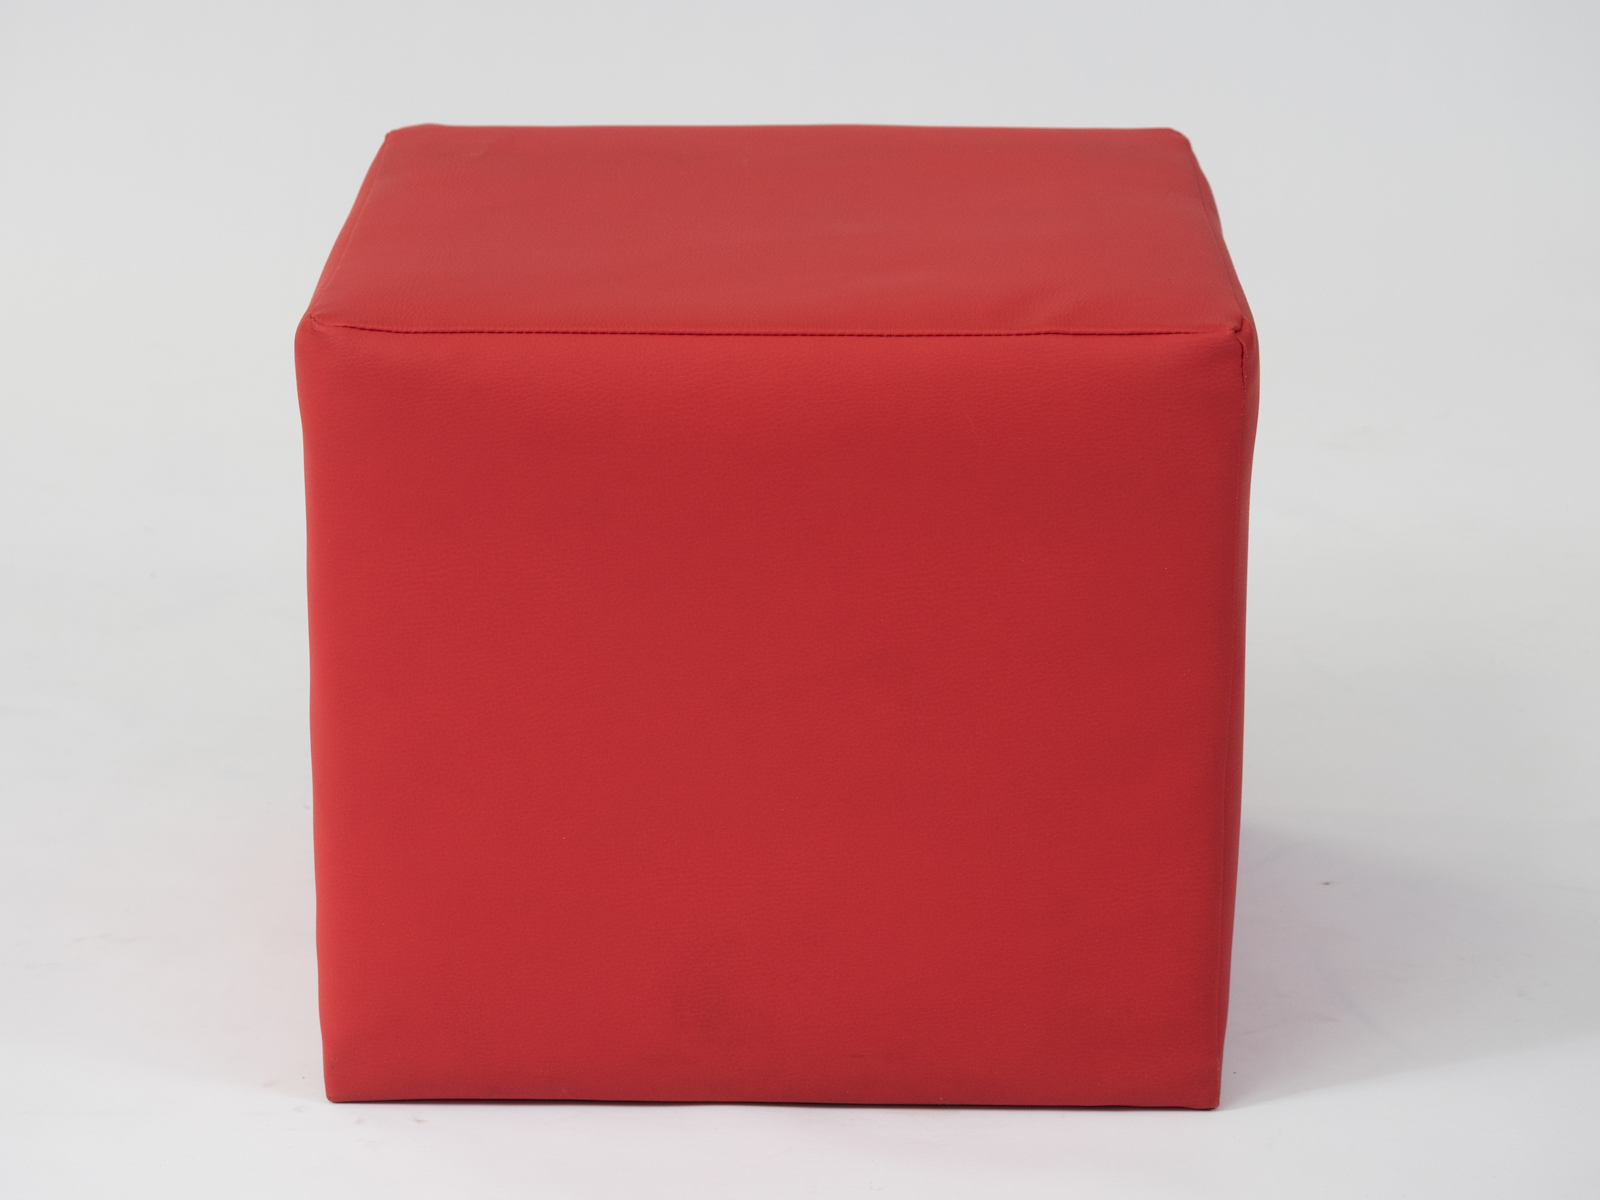 Peachy Club Ottoman Red Creativecarmelina Interior Chair Design Creativecarmelinacom